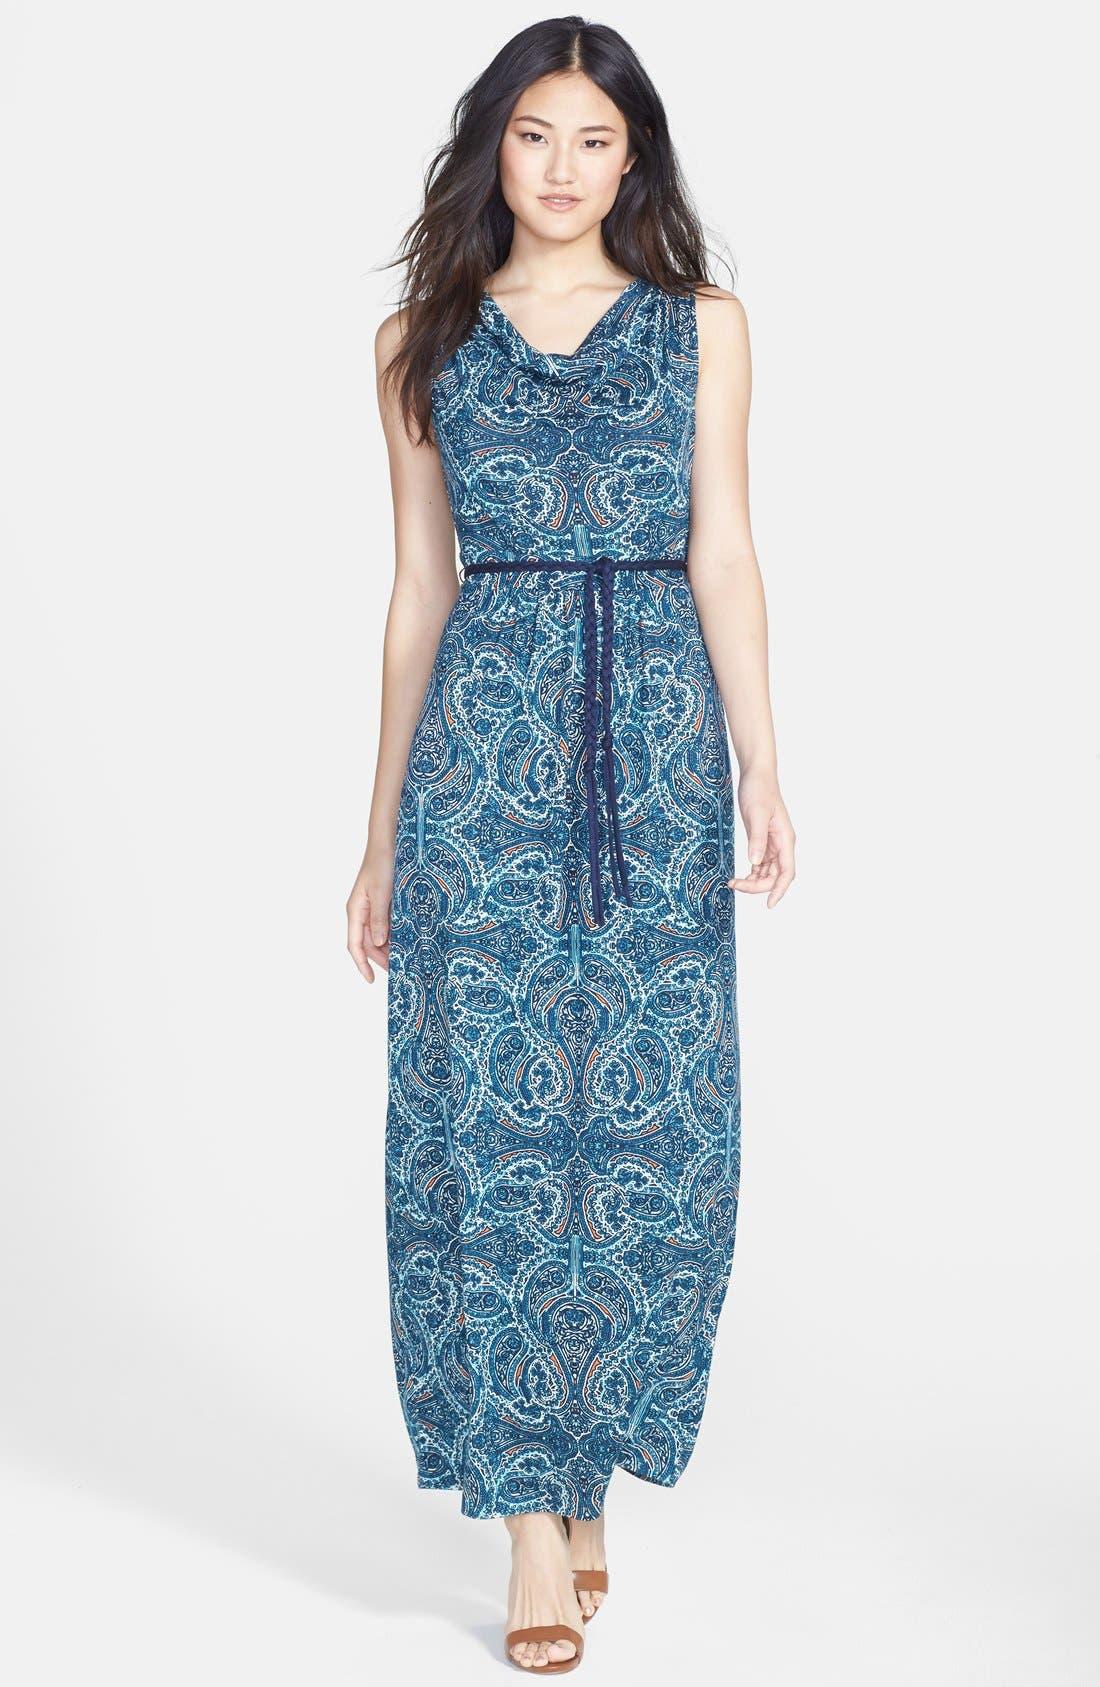 Alternate Image 1 Selected - NIC+ZOE 'Pop of Paisley' Maxi Dress (Regular & Petite)